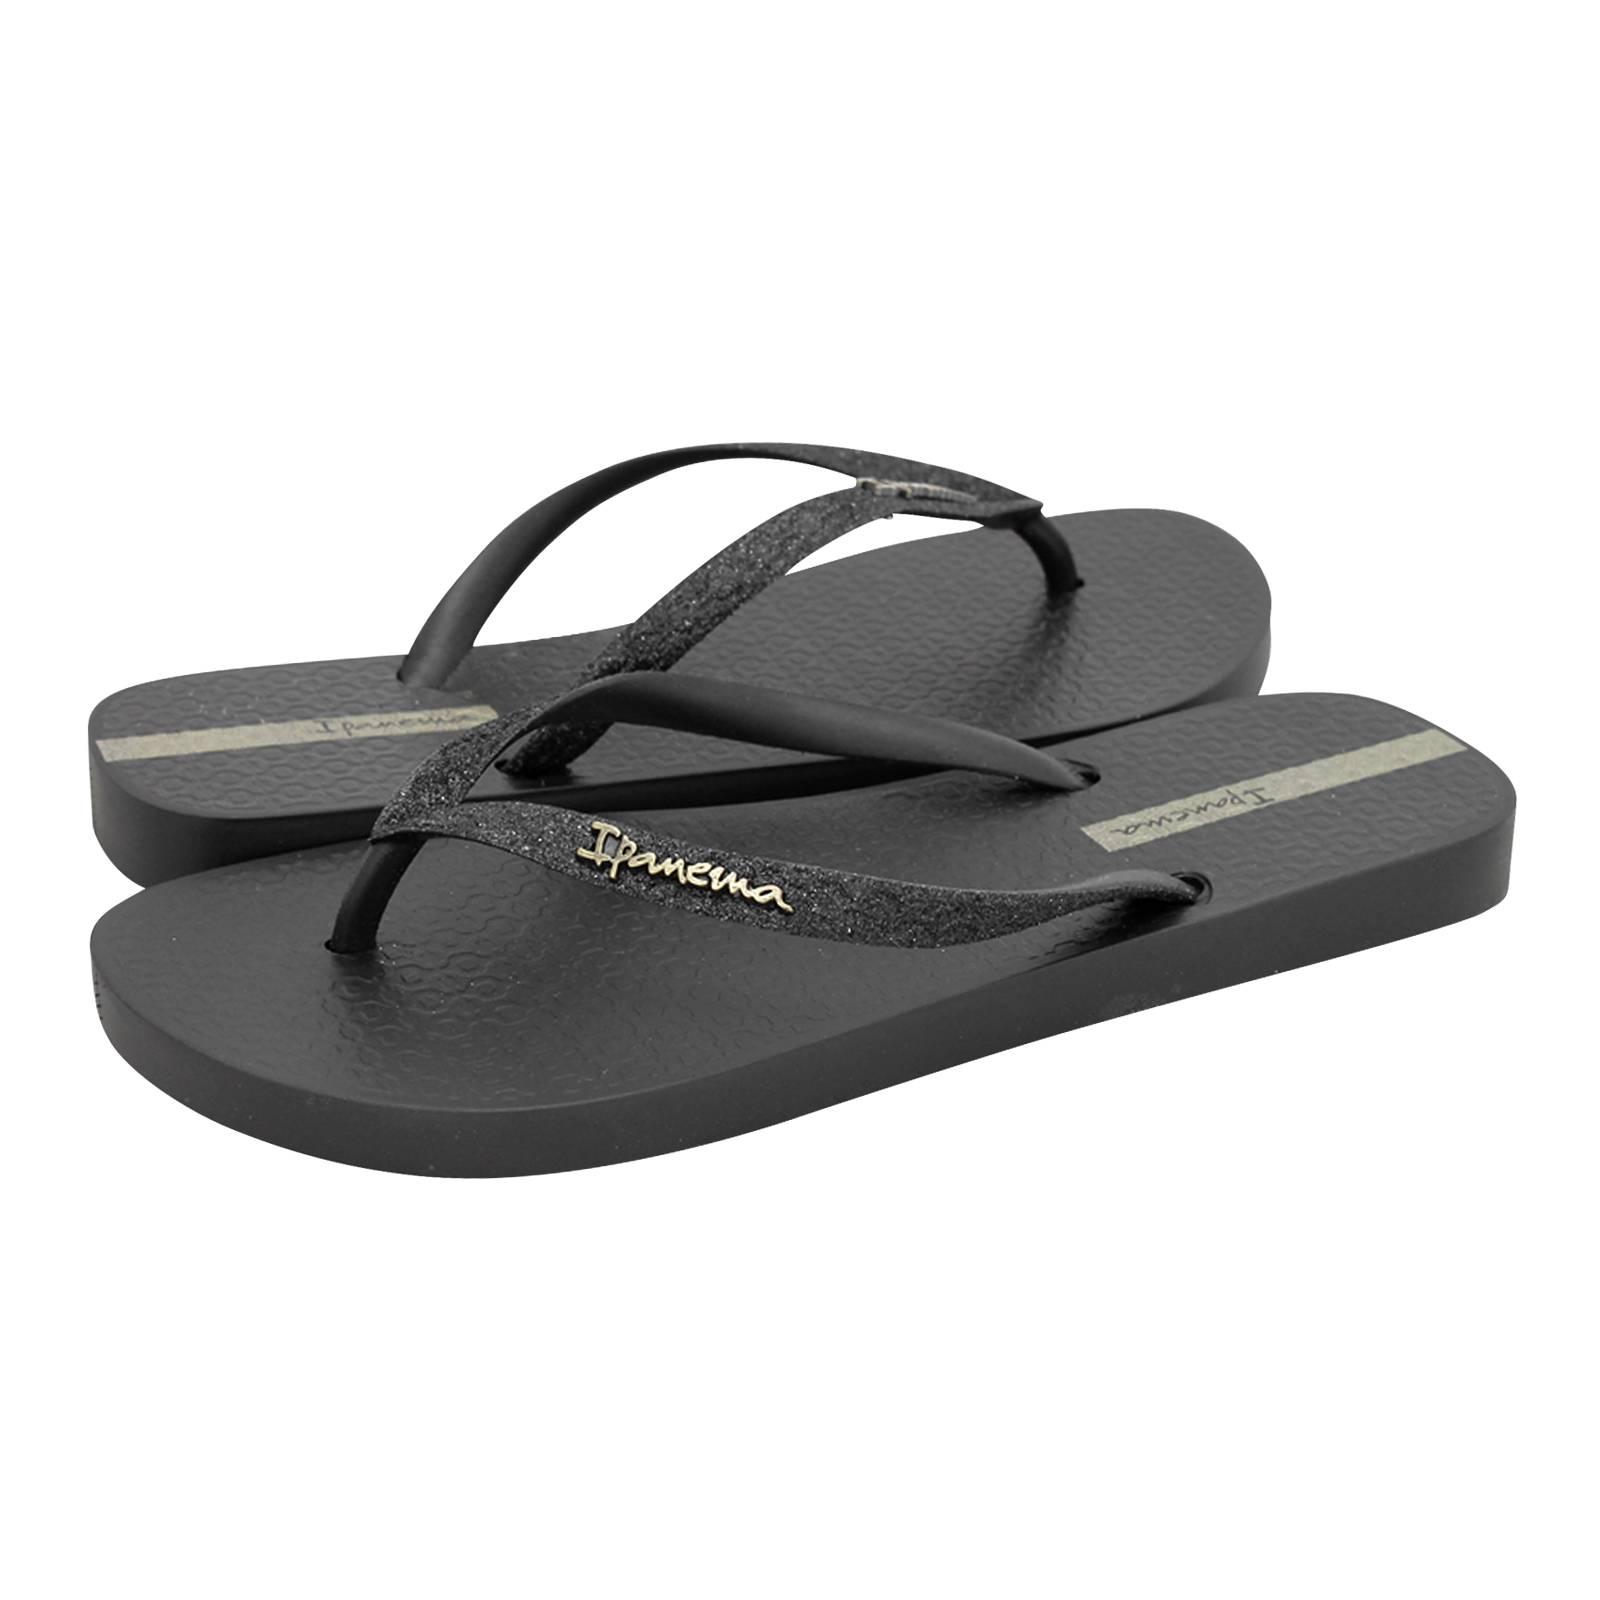 e06361cdb8cb2e Lolita III - Ipanema Women s flat sandals made of p.v.c. and glitter ...